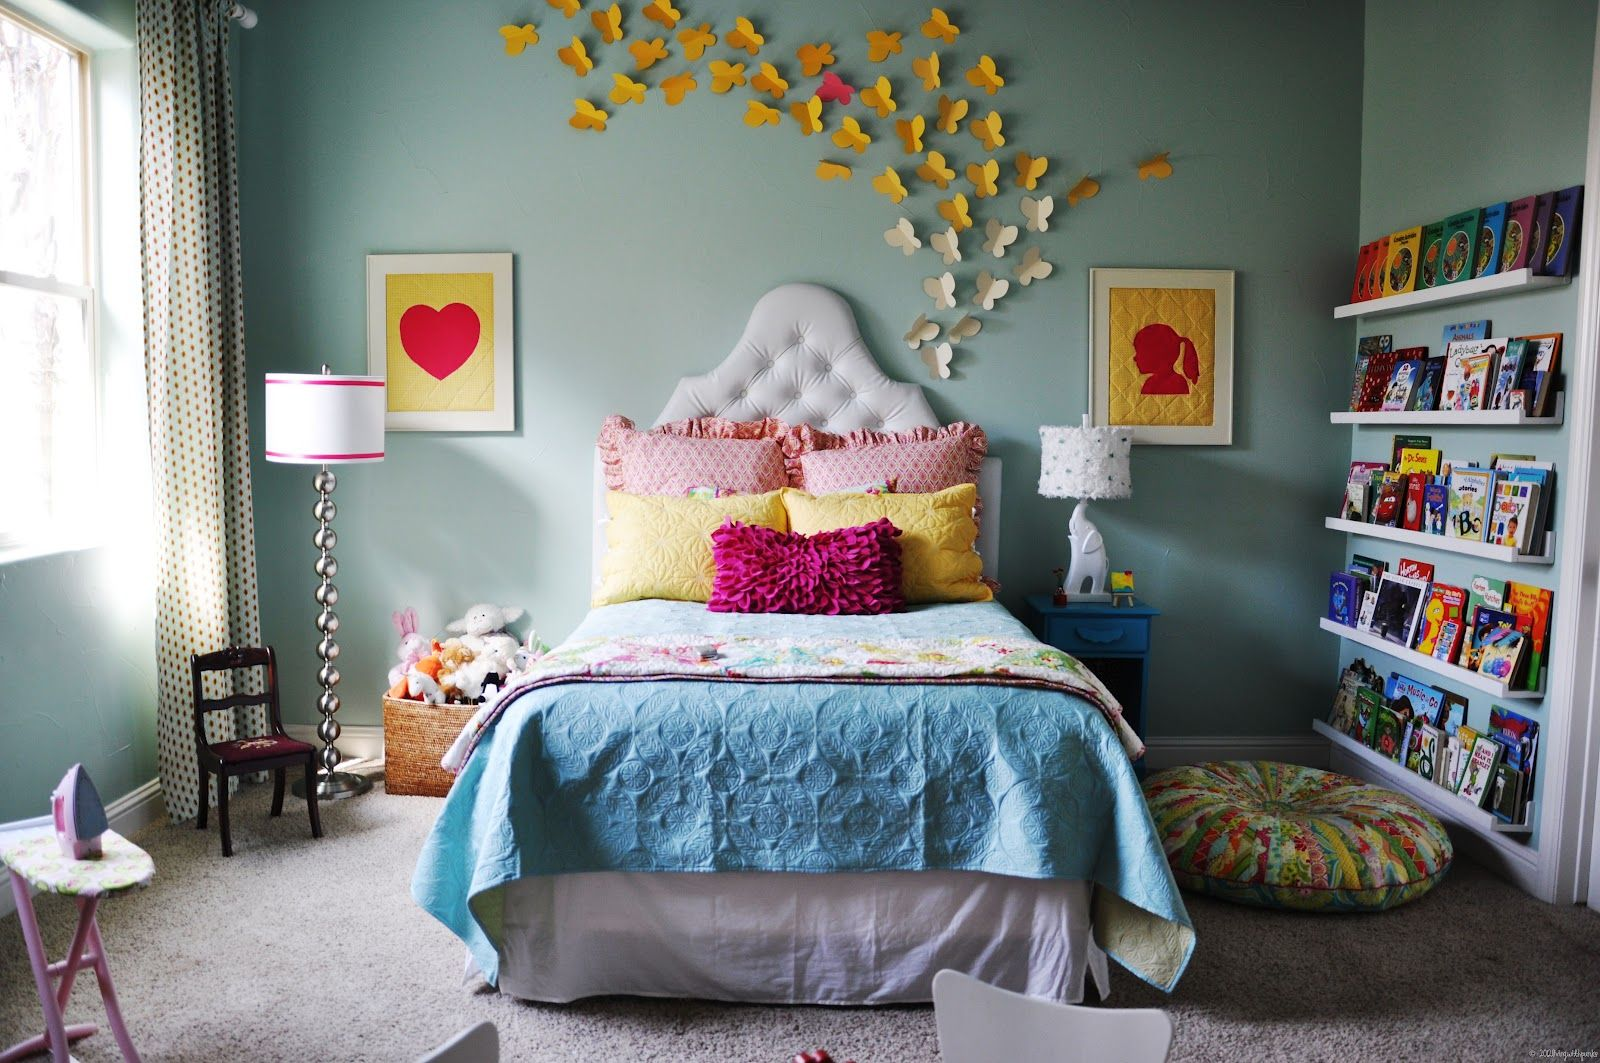 Big Girl Bedroom Ideas Girls bedroom, Girl room